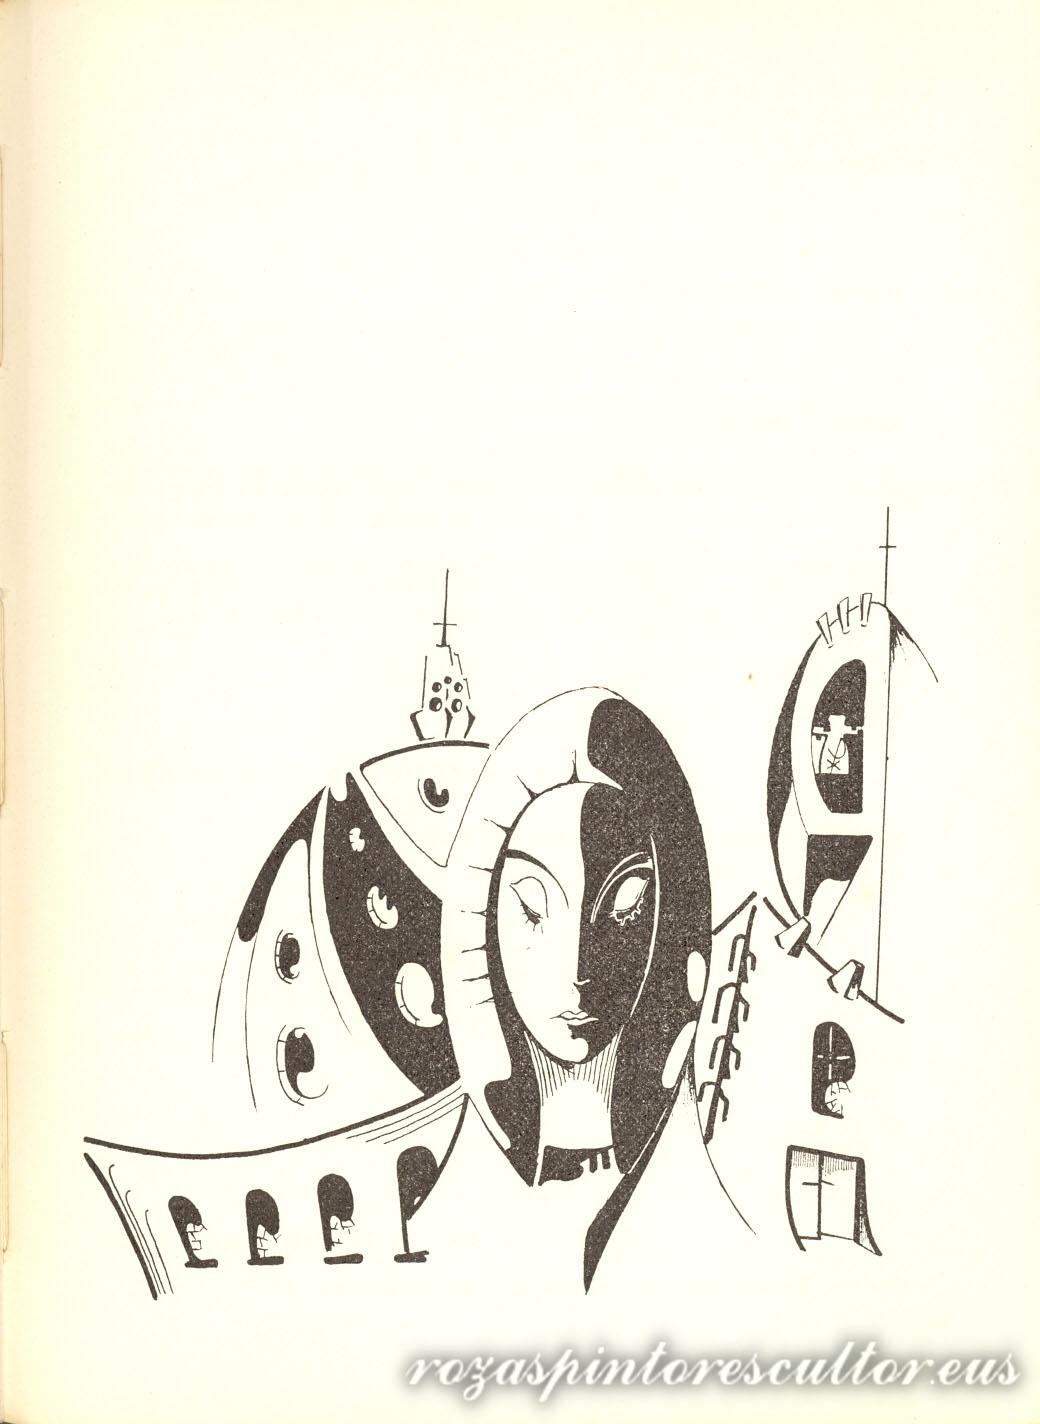 1966 Marian Misterioak 12